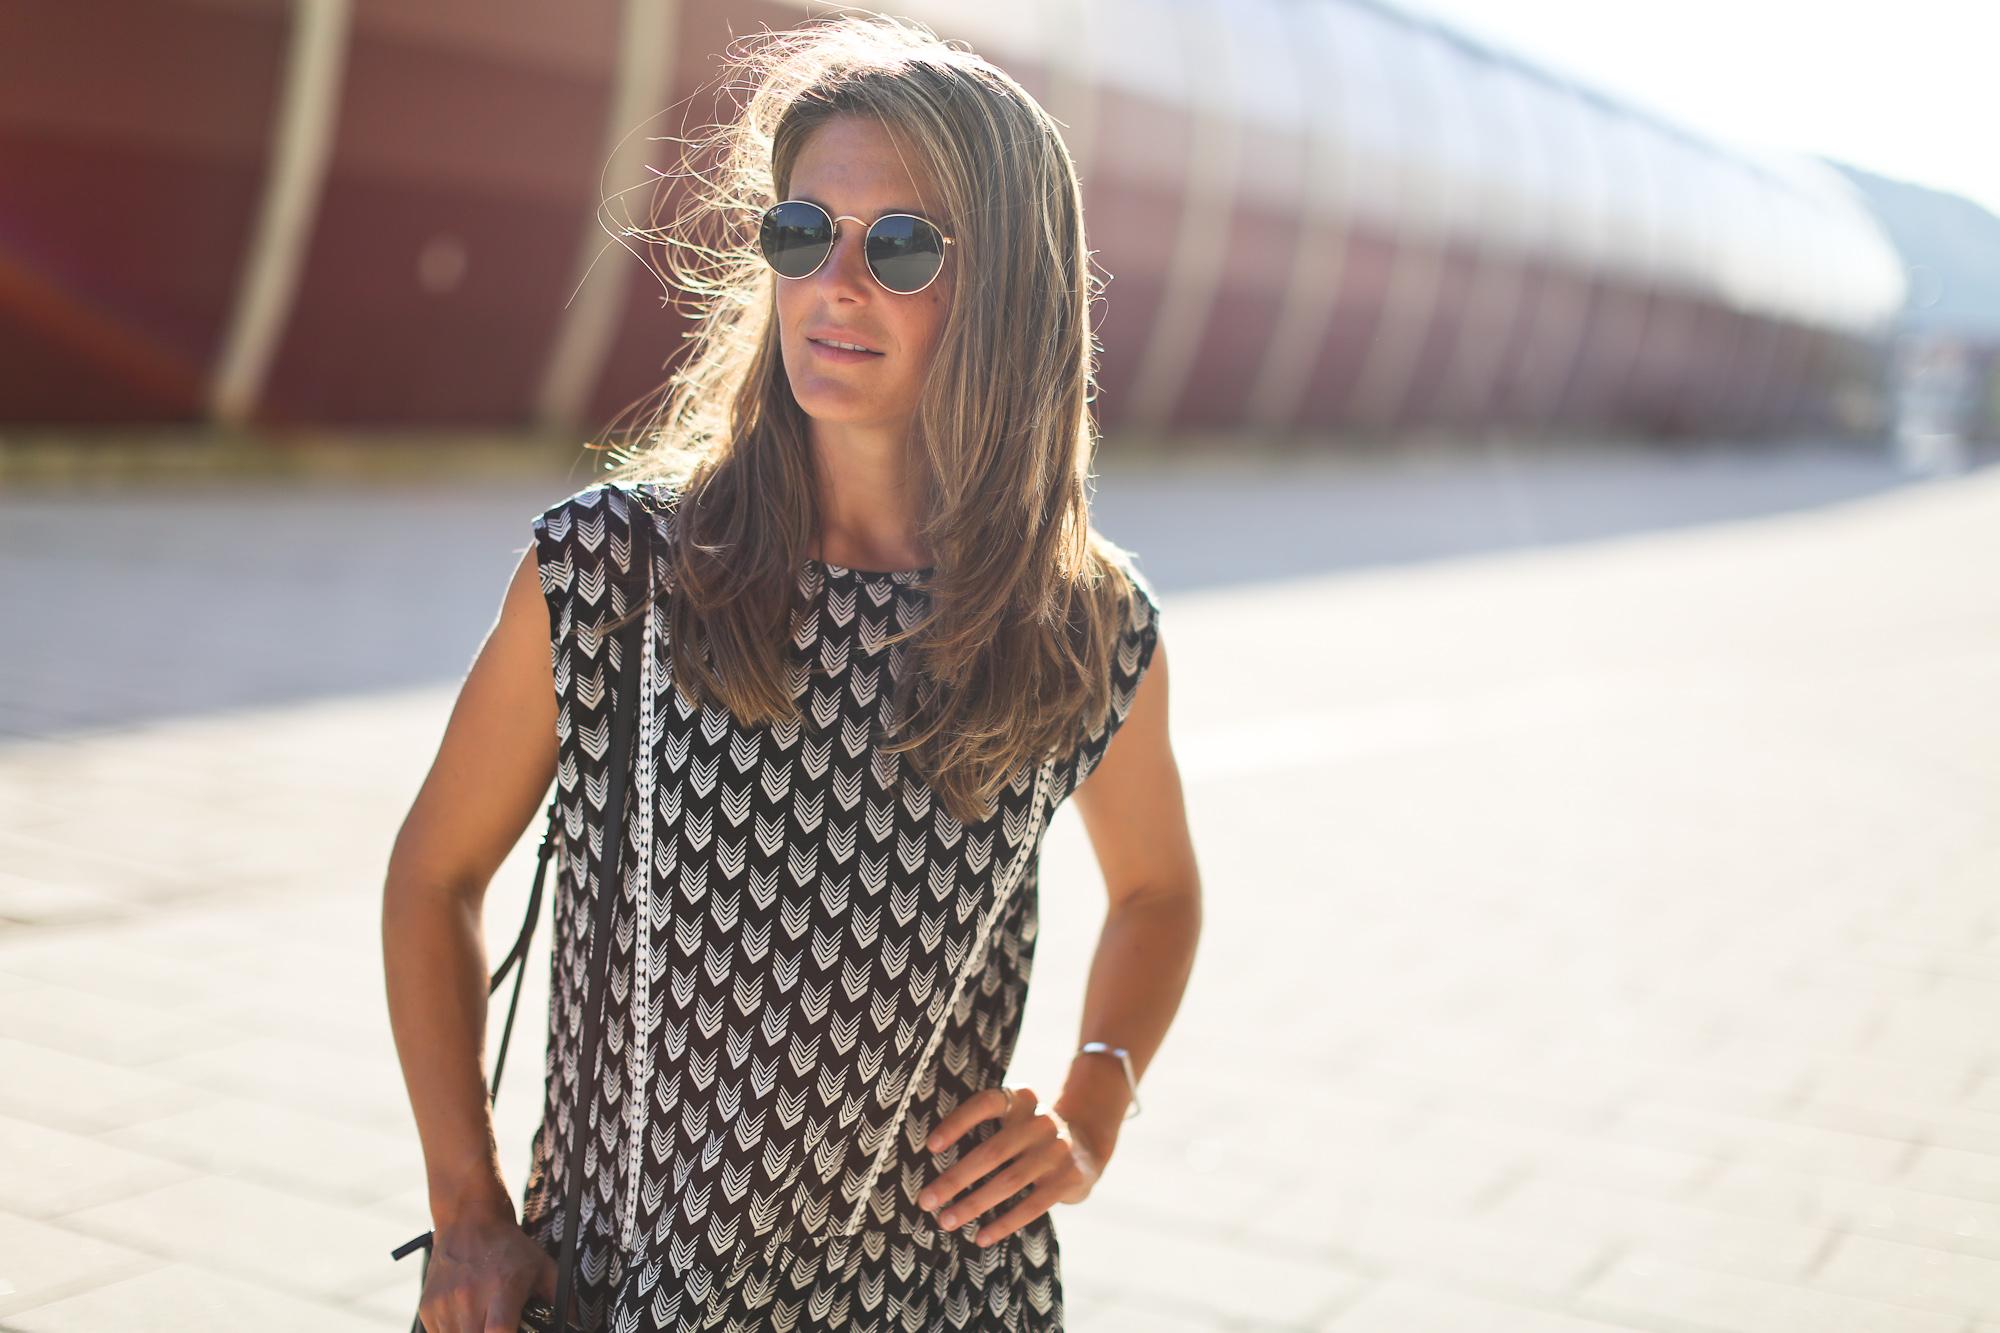 Clochet_streetstyle_chicwish_midi_printed_summer_dress-10